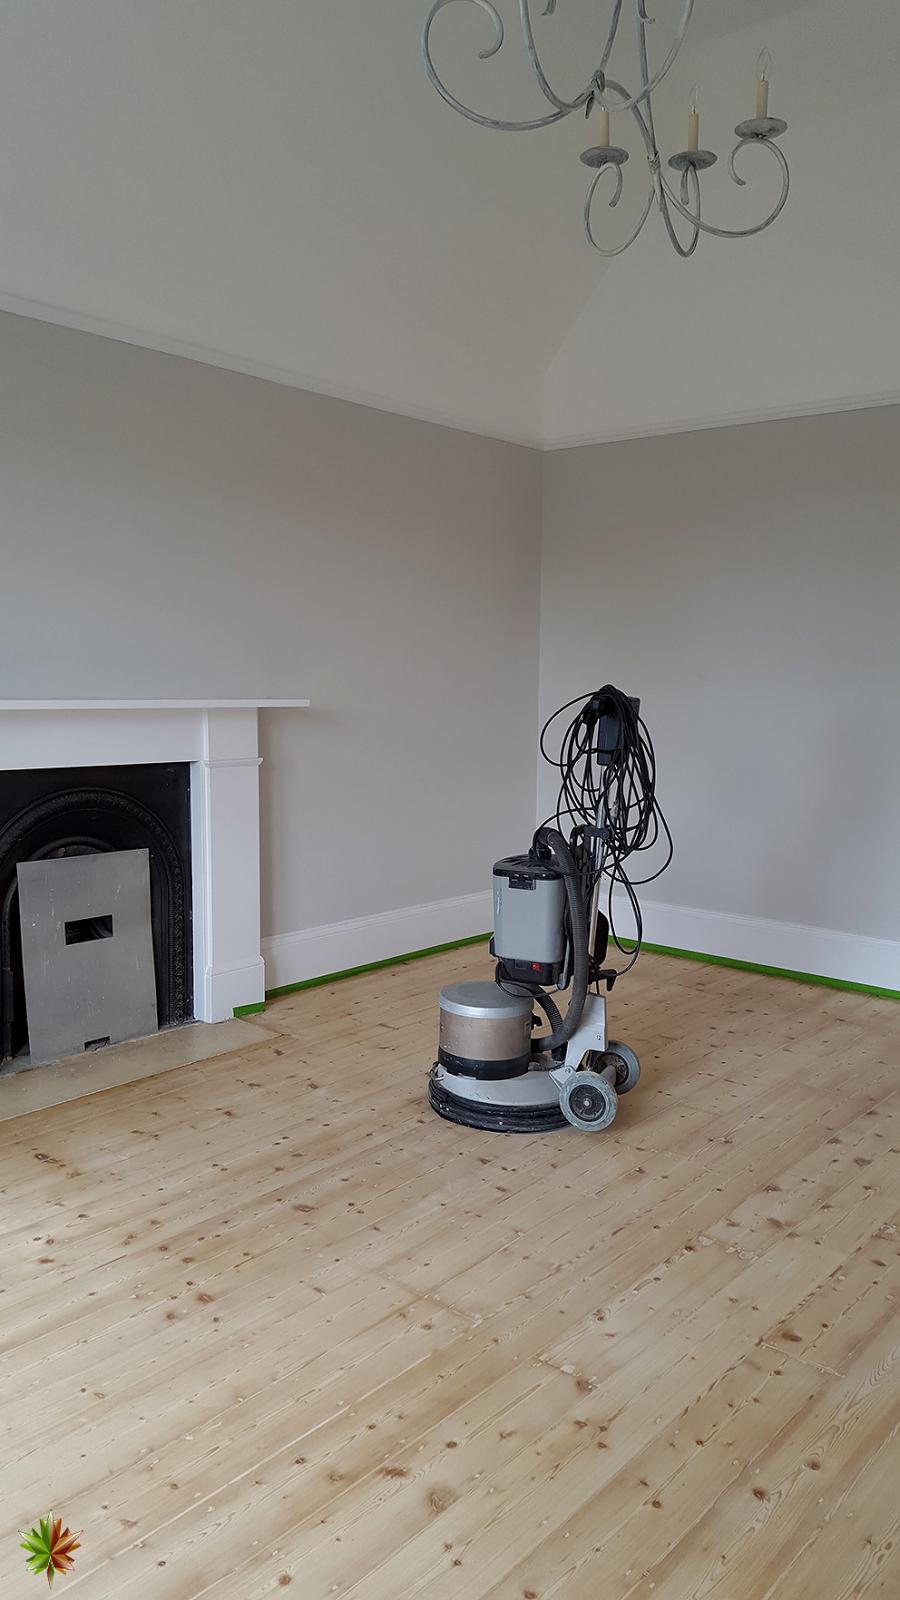 Surrey Flooring Services - store  | Photo 10 of 10 | Address: 65 Cotterill Rd, Surbiton KT6 7UJ, UK | Phone: 020 8875 1260